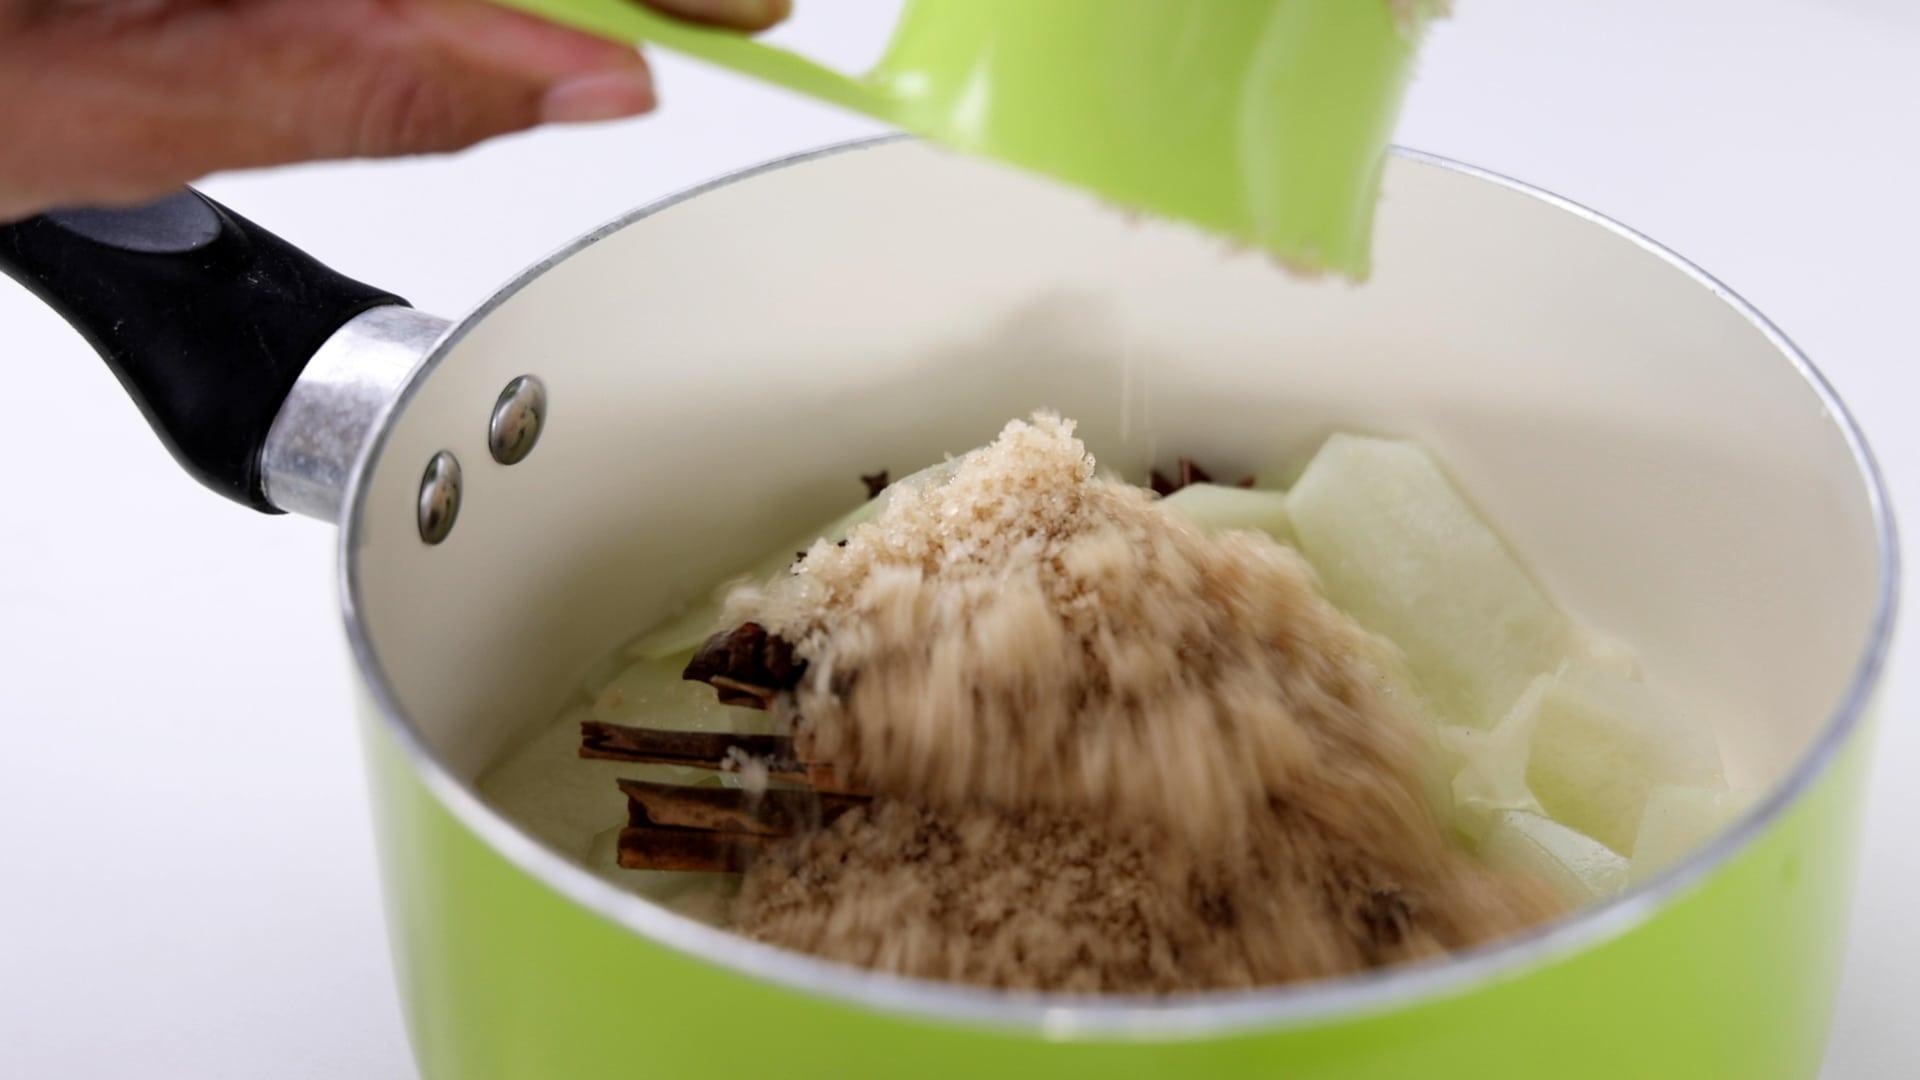 Adding sugar to the saucepan